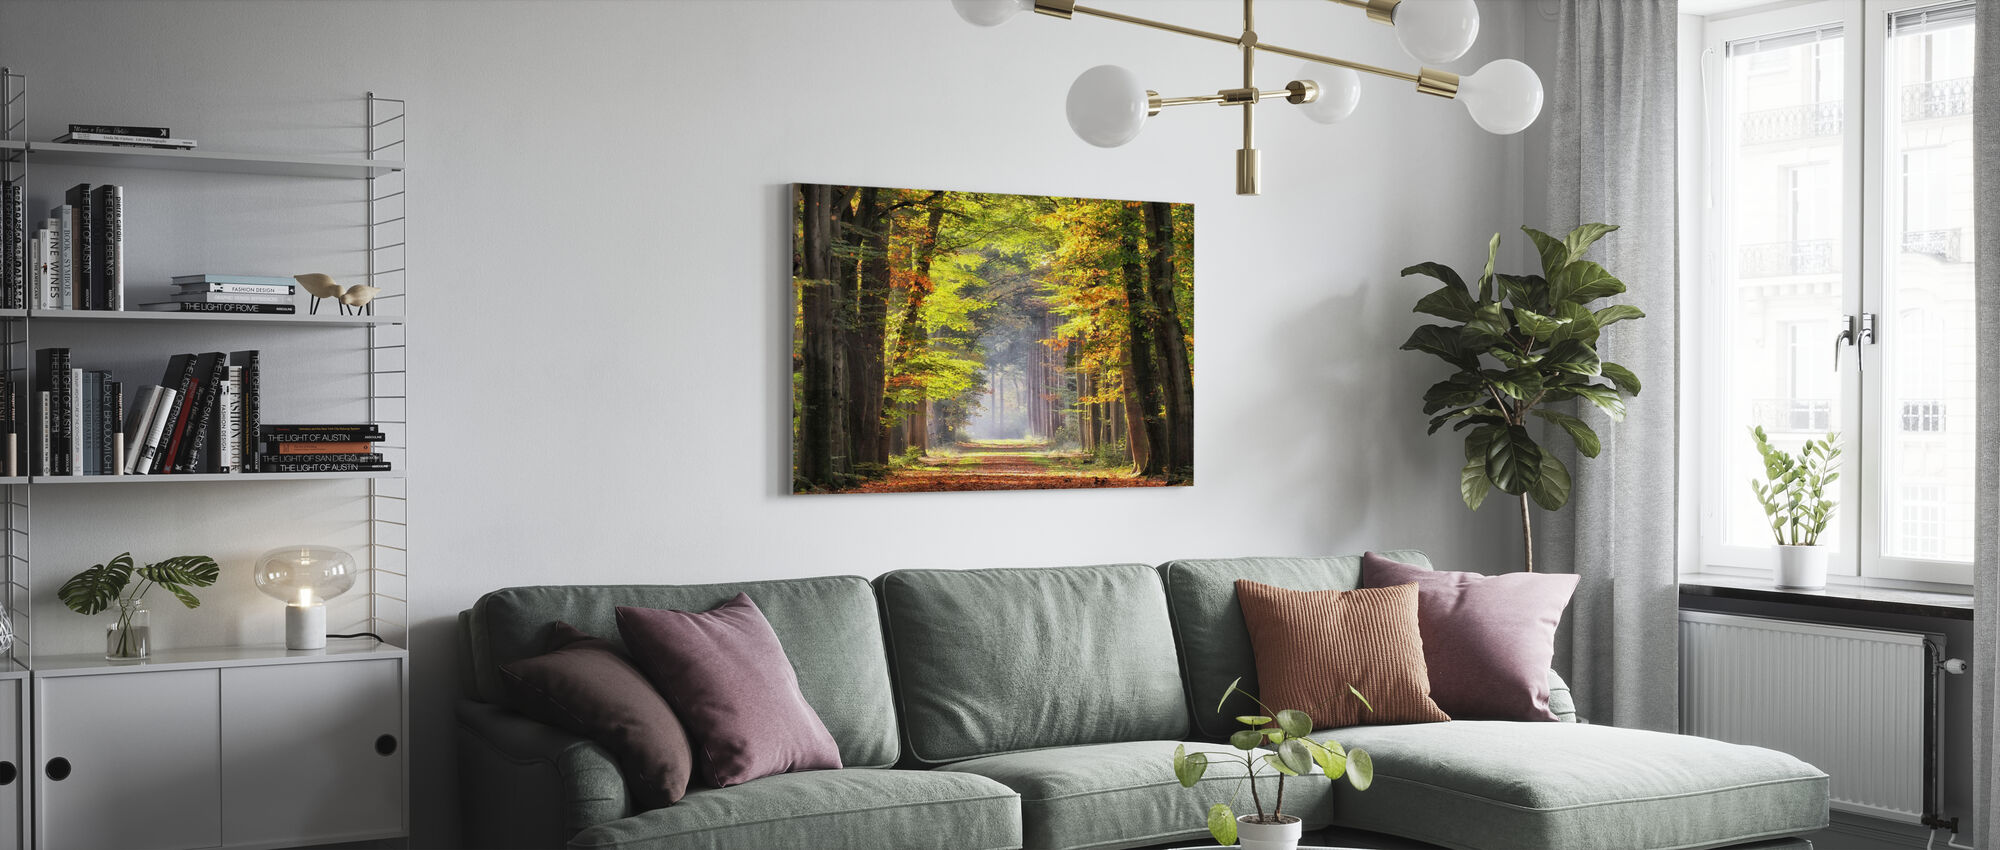 Avenue of Beech Trees - Canvas print - Living Room